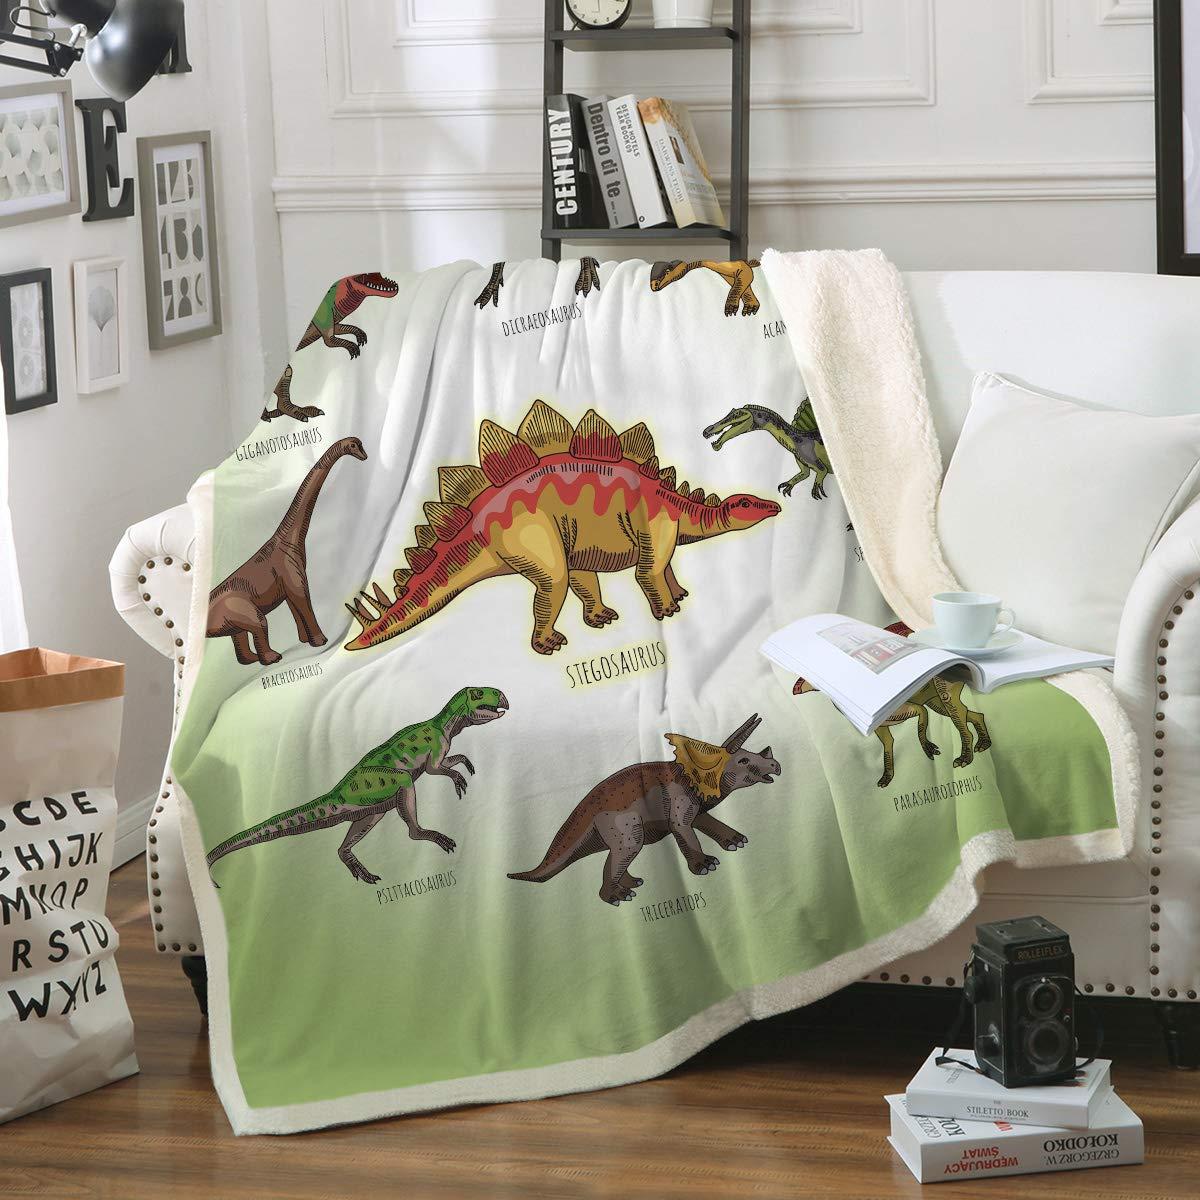 Sleepwish Dinosaur Throw Blanket Kids Boys Ancient Animal Sherpa Fleece Blanket Green White Dinosaurs Blankets (50'' x 60'')